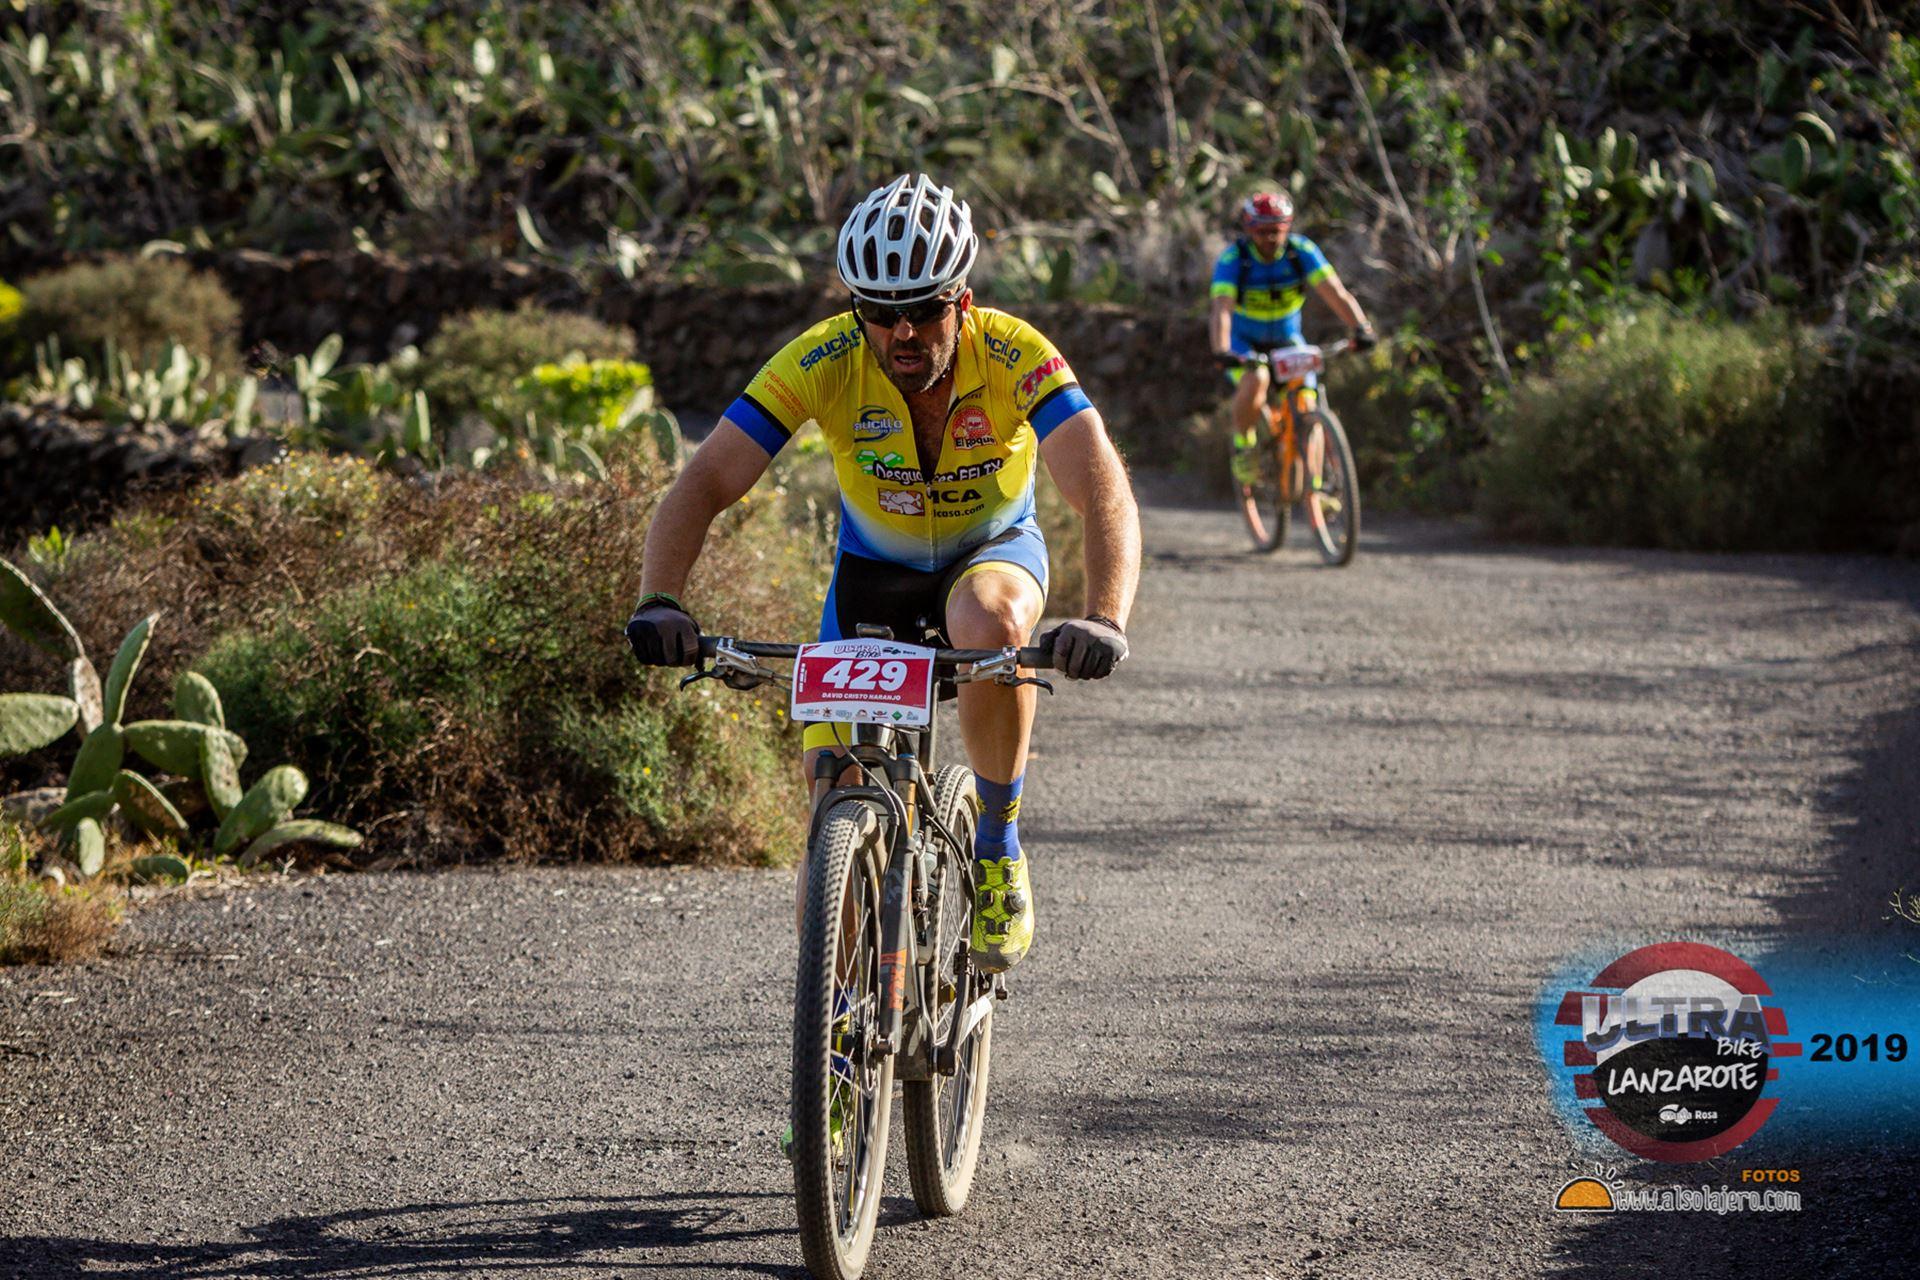 Sector Guatiza 2ª Etapa Ultrabike 2019 Fotos Alsolajero.com-149